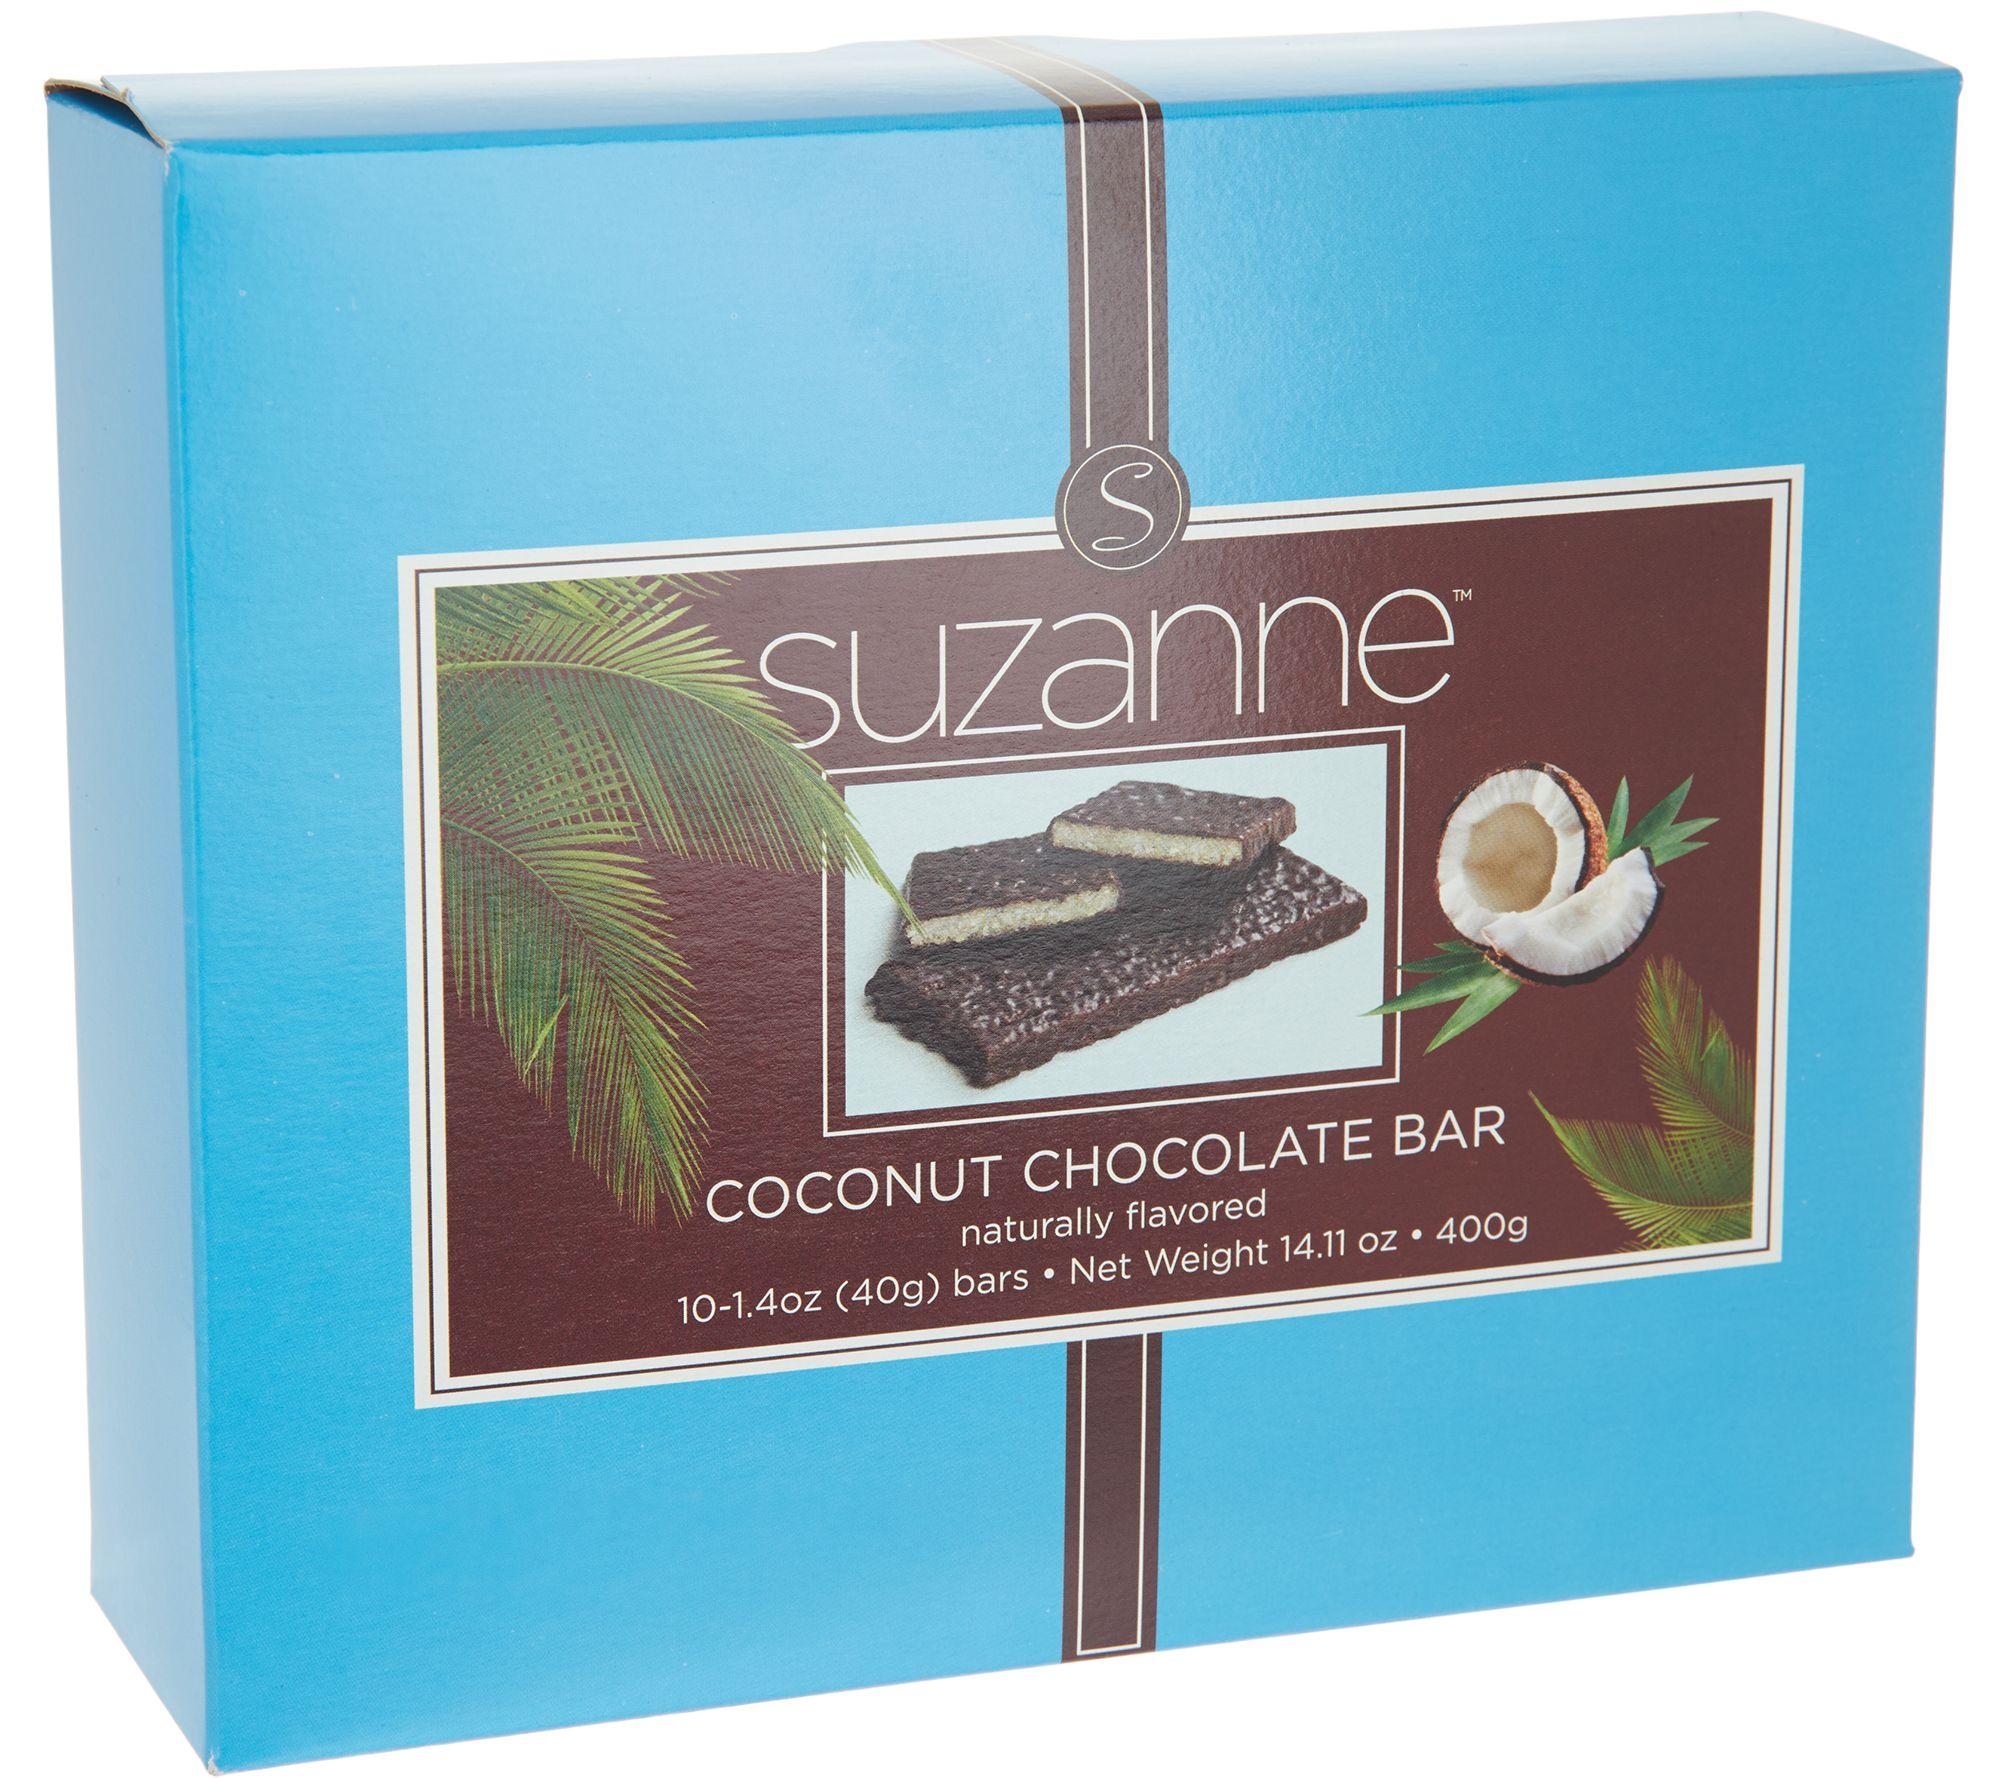 SUZANNE Coconut Chocolate Bars - 10 Bars - Page 1 — QVC.com